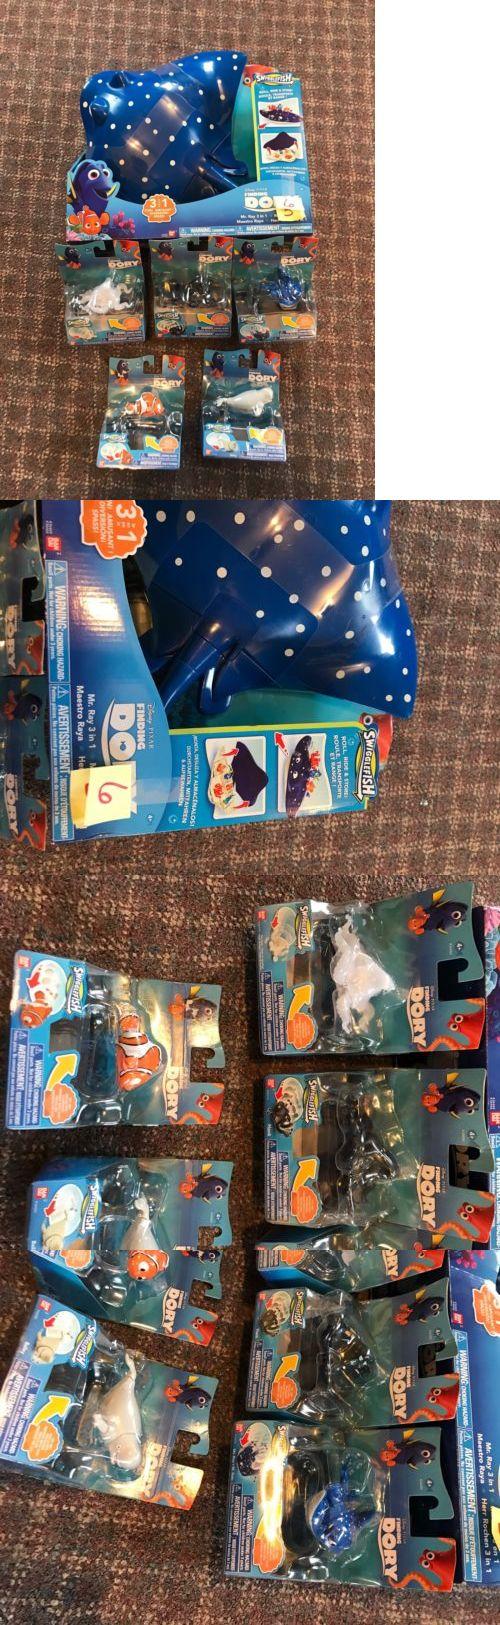 Finding Nemo 50310: Disney Finding Dory Swigglefish Toys Lot Mr. Ray Hank Tile Hank Nemo Bailey Nib -> BUY IT NOW ONLY: $62.99 on eBay!